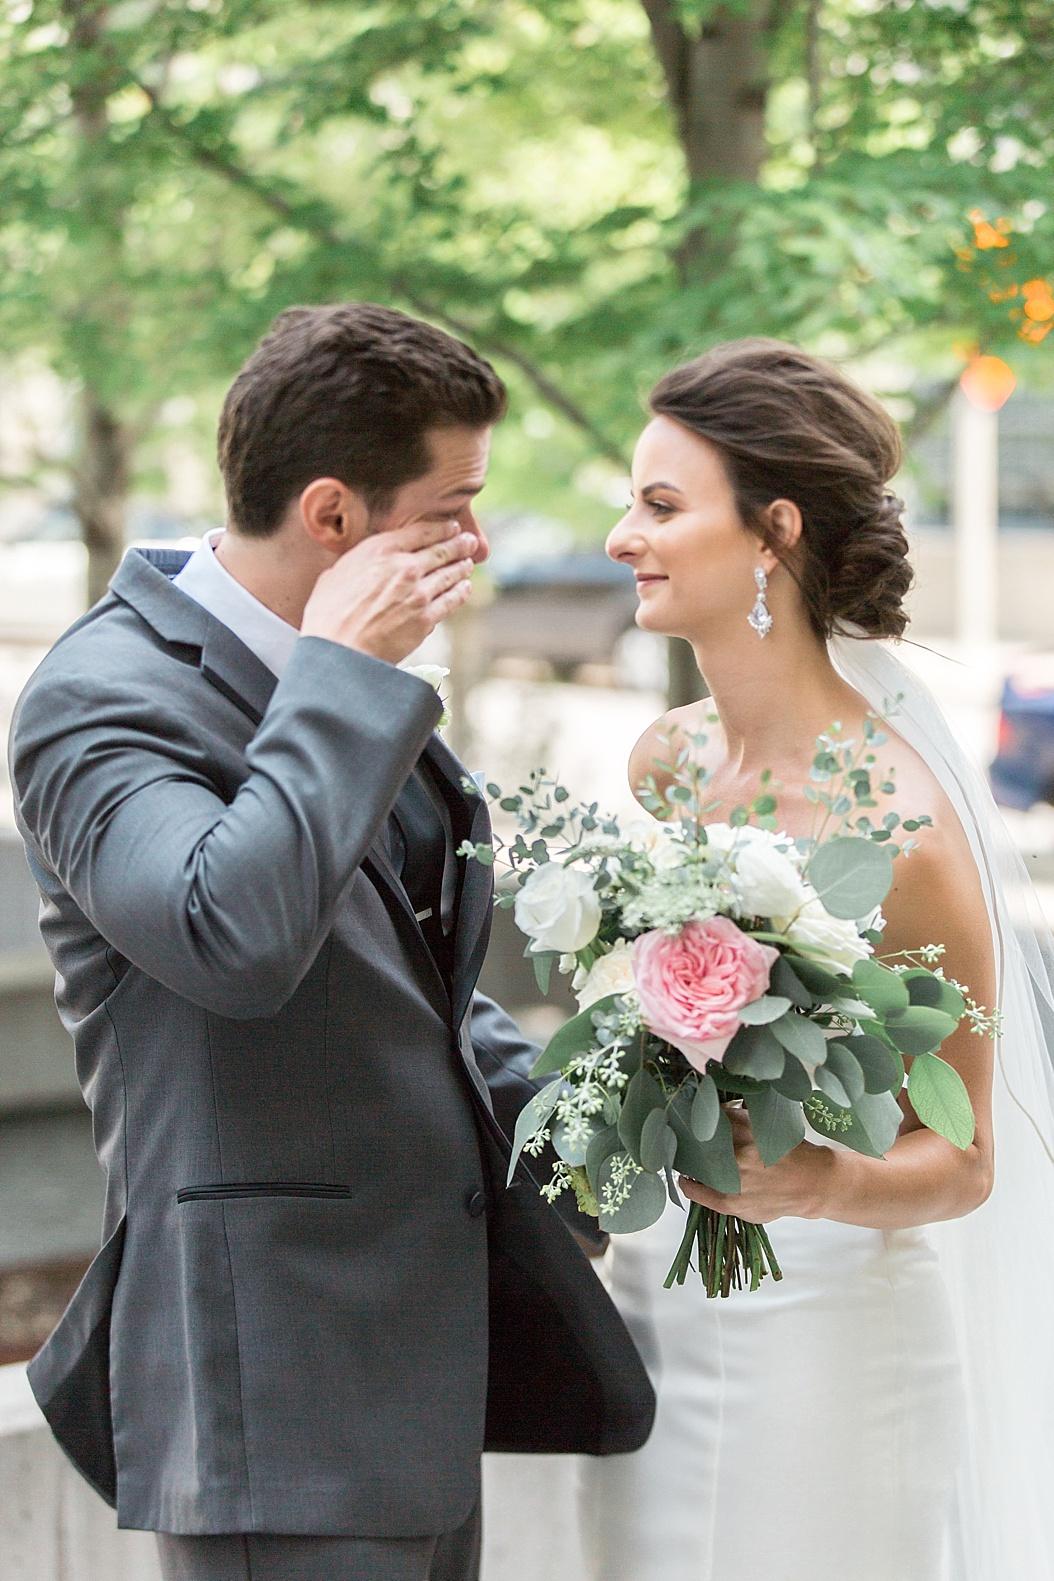 Historic Pabst Mansion Wedding - Ricci_0027.jpg